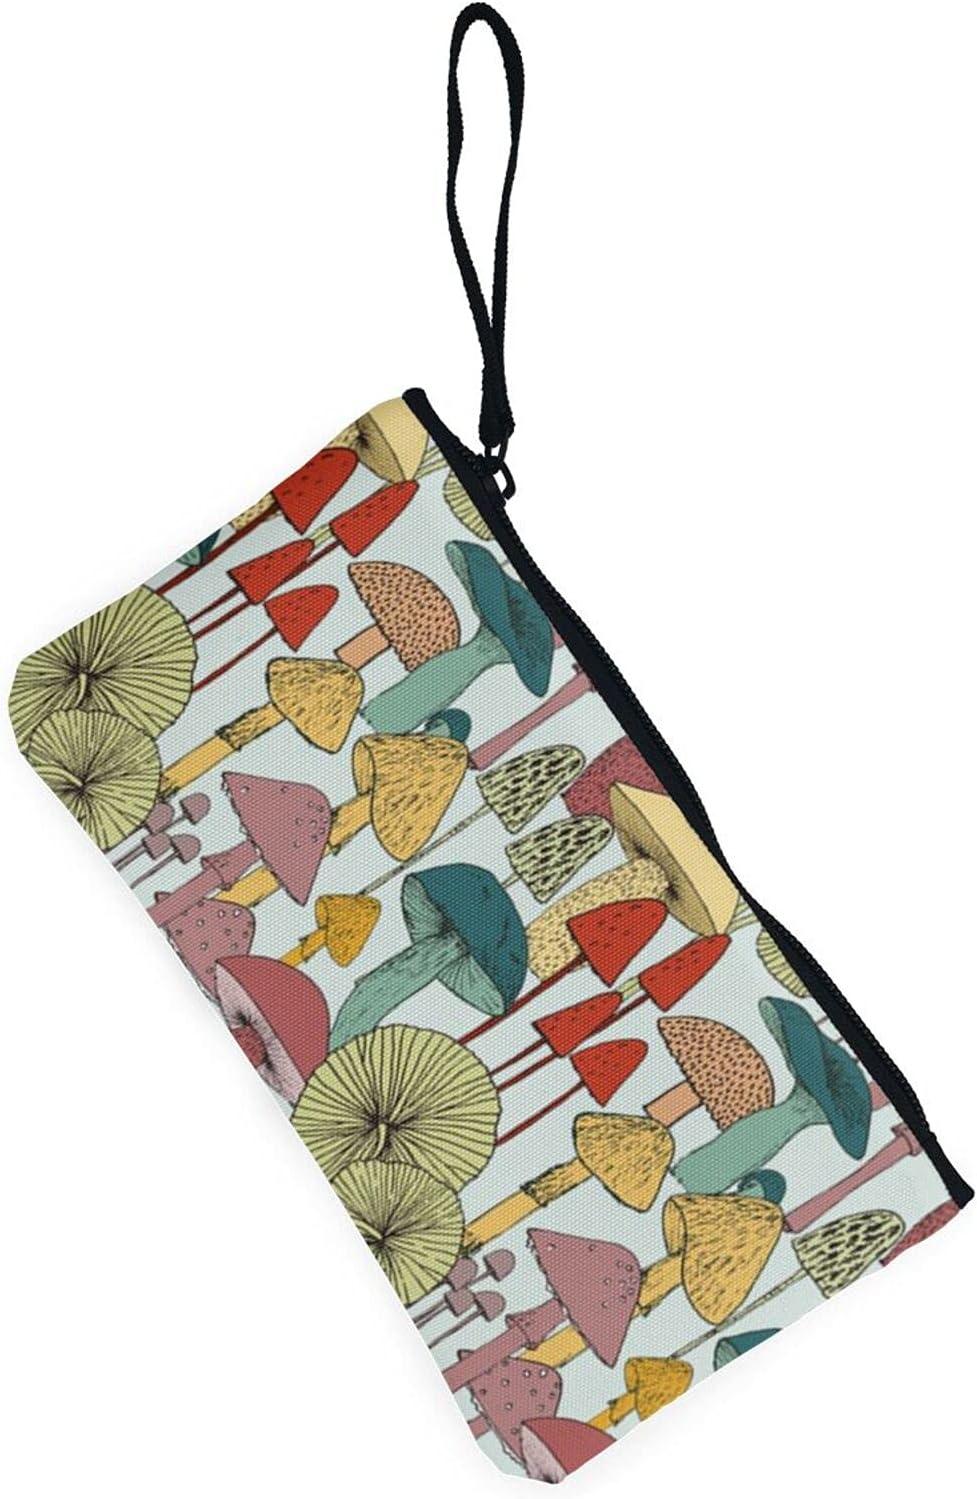 AORRUAM Mushrooms Canvas Coin Purse,Canvas Zipper Pencil Cases,Canvas Change Purse Pouch Mini Wallet Coin Bag